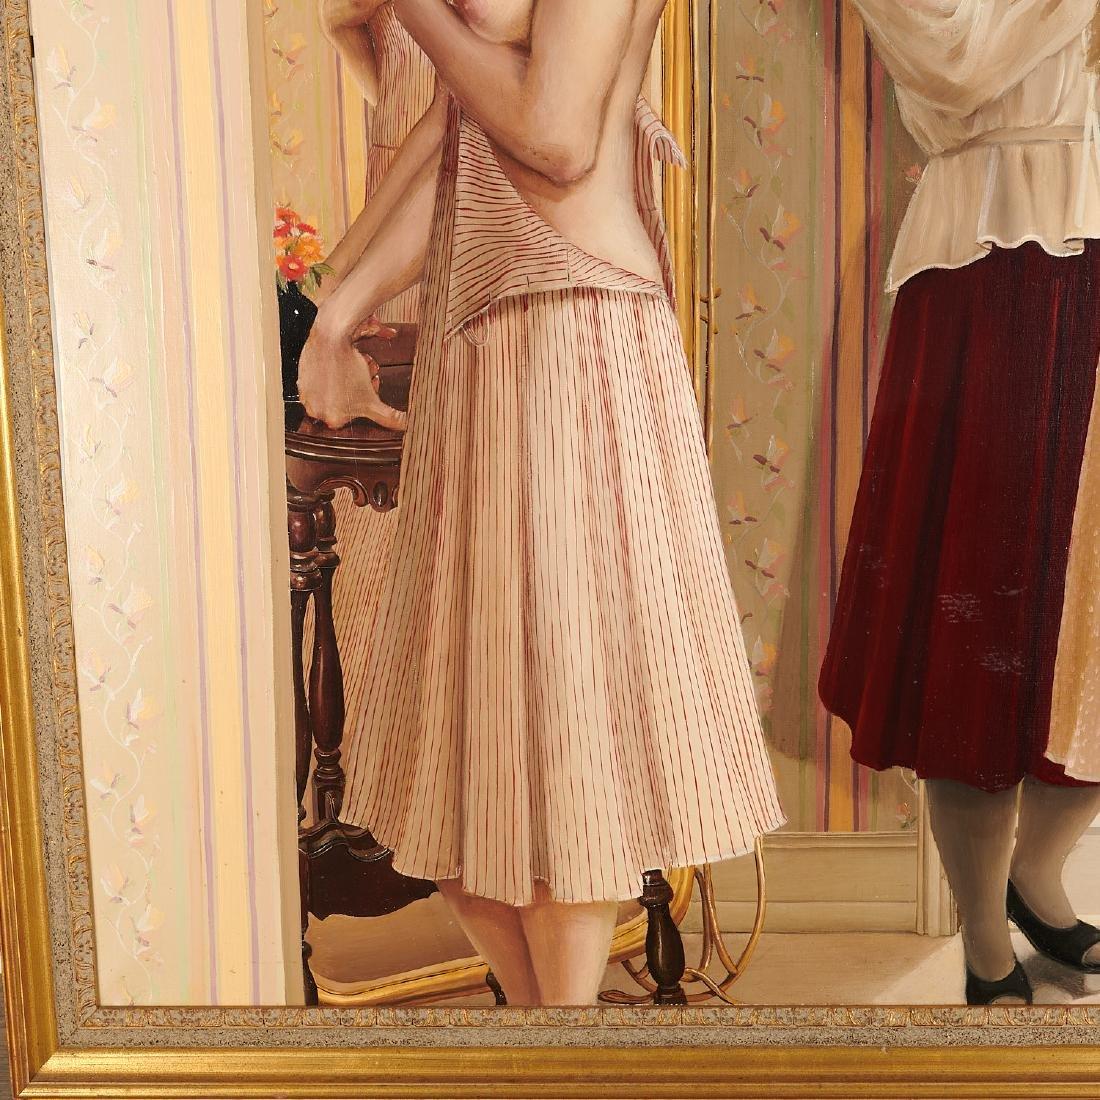 Claire Klarewicz-Okser, large scale painting, 1983 - 5